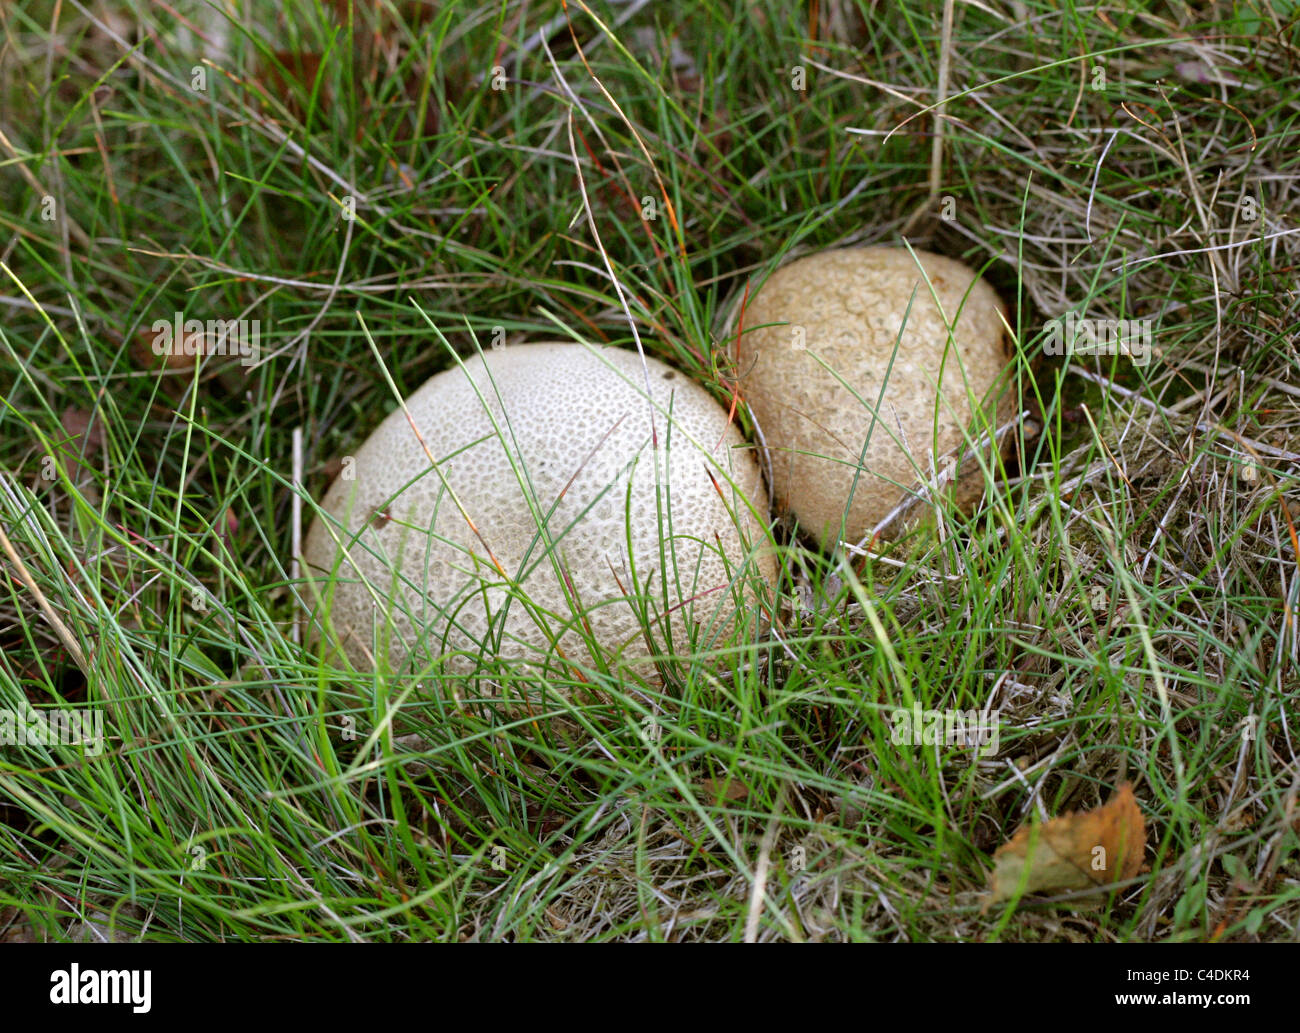 Bola de masa escamosa hongos Scleroderma verrucosum, Sclerodermataceae. Rammamere Heath, Bedfordshire, Reino Unido. Imagen De Stock